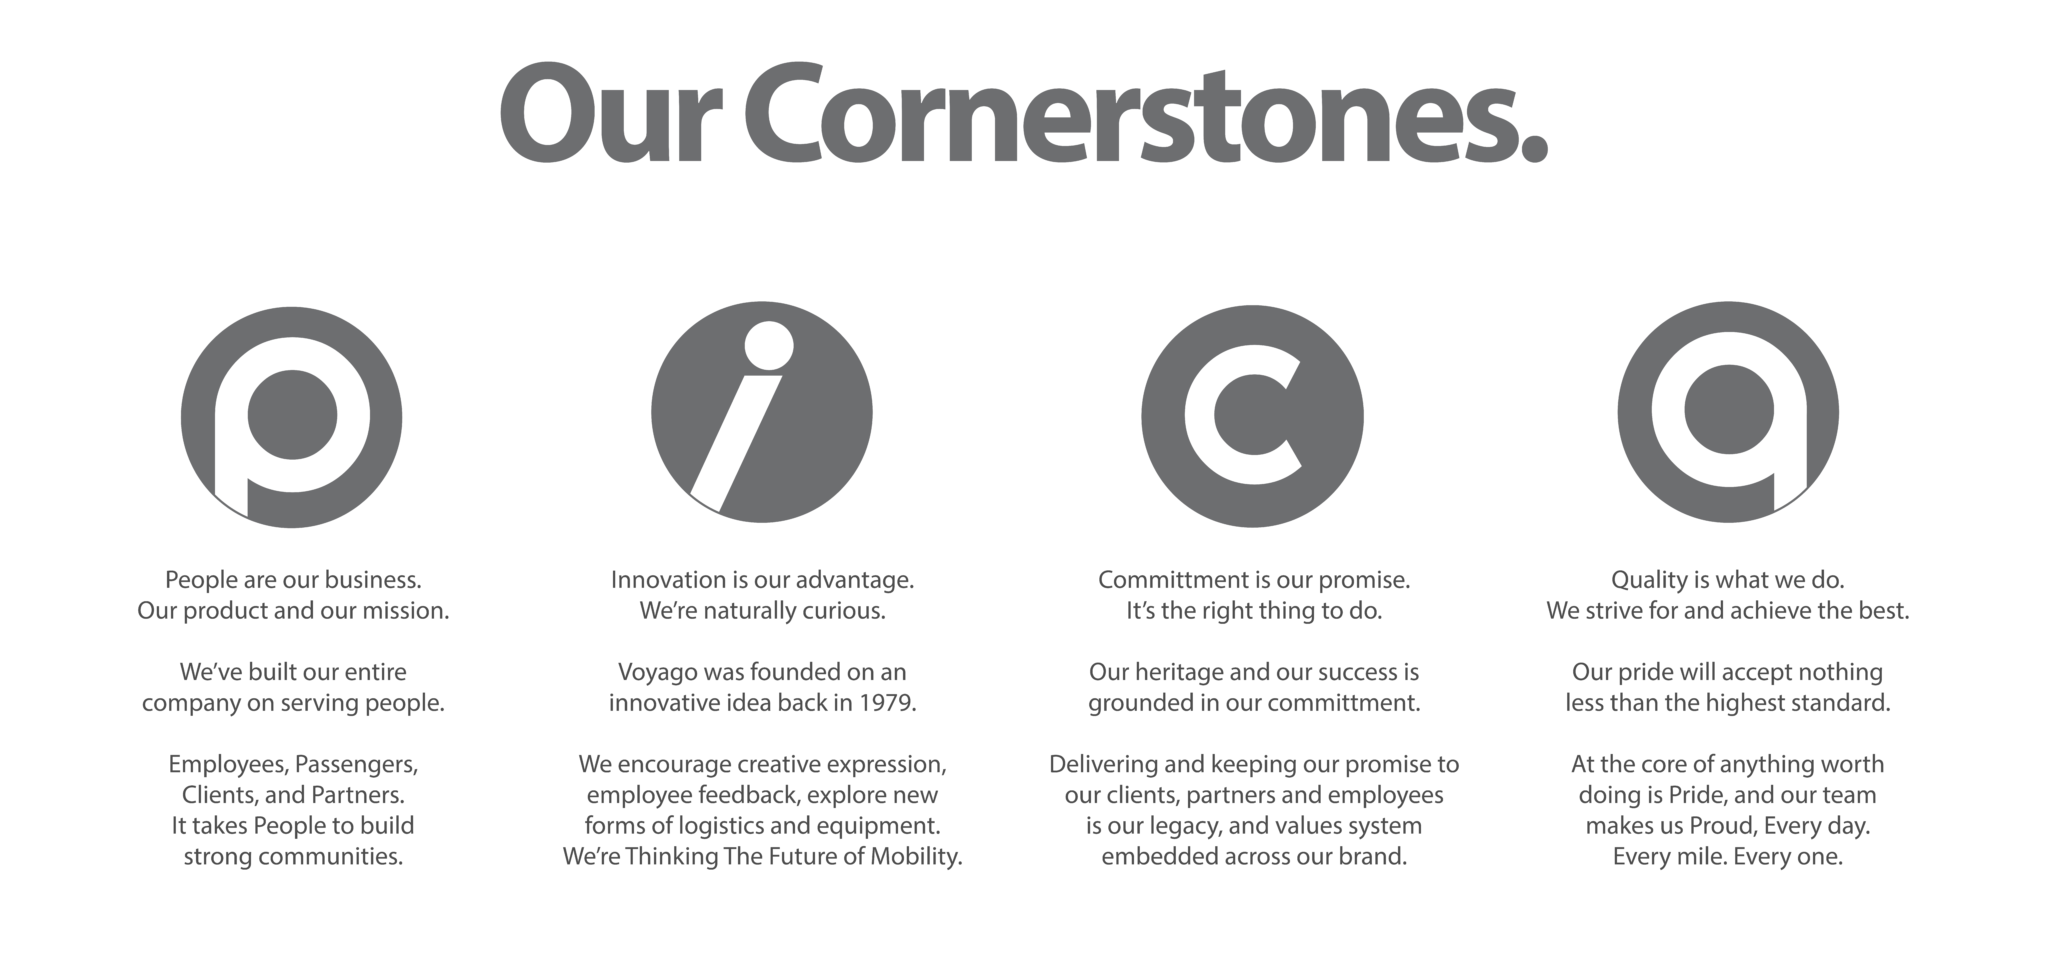 VoyagoWEB_CorpPage_cornerstones_Image-01